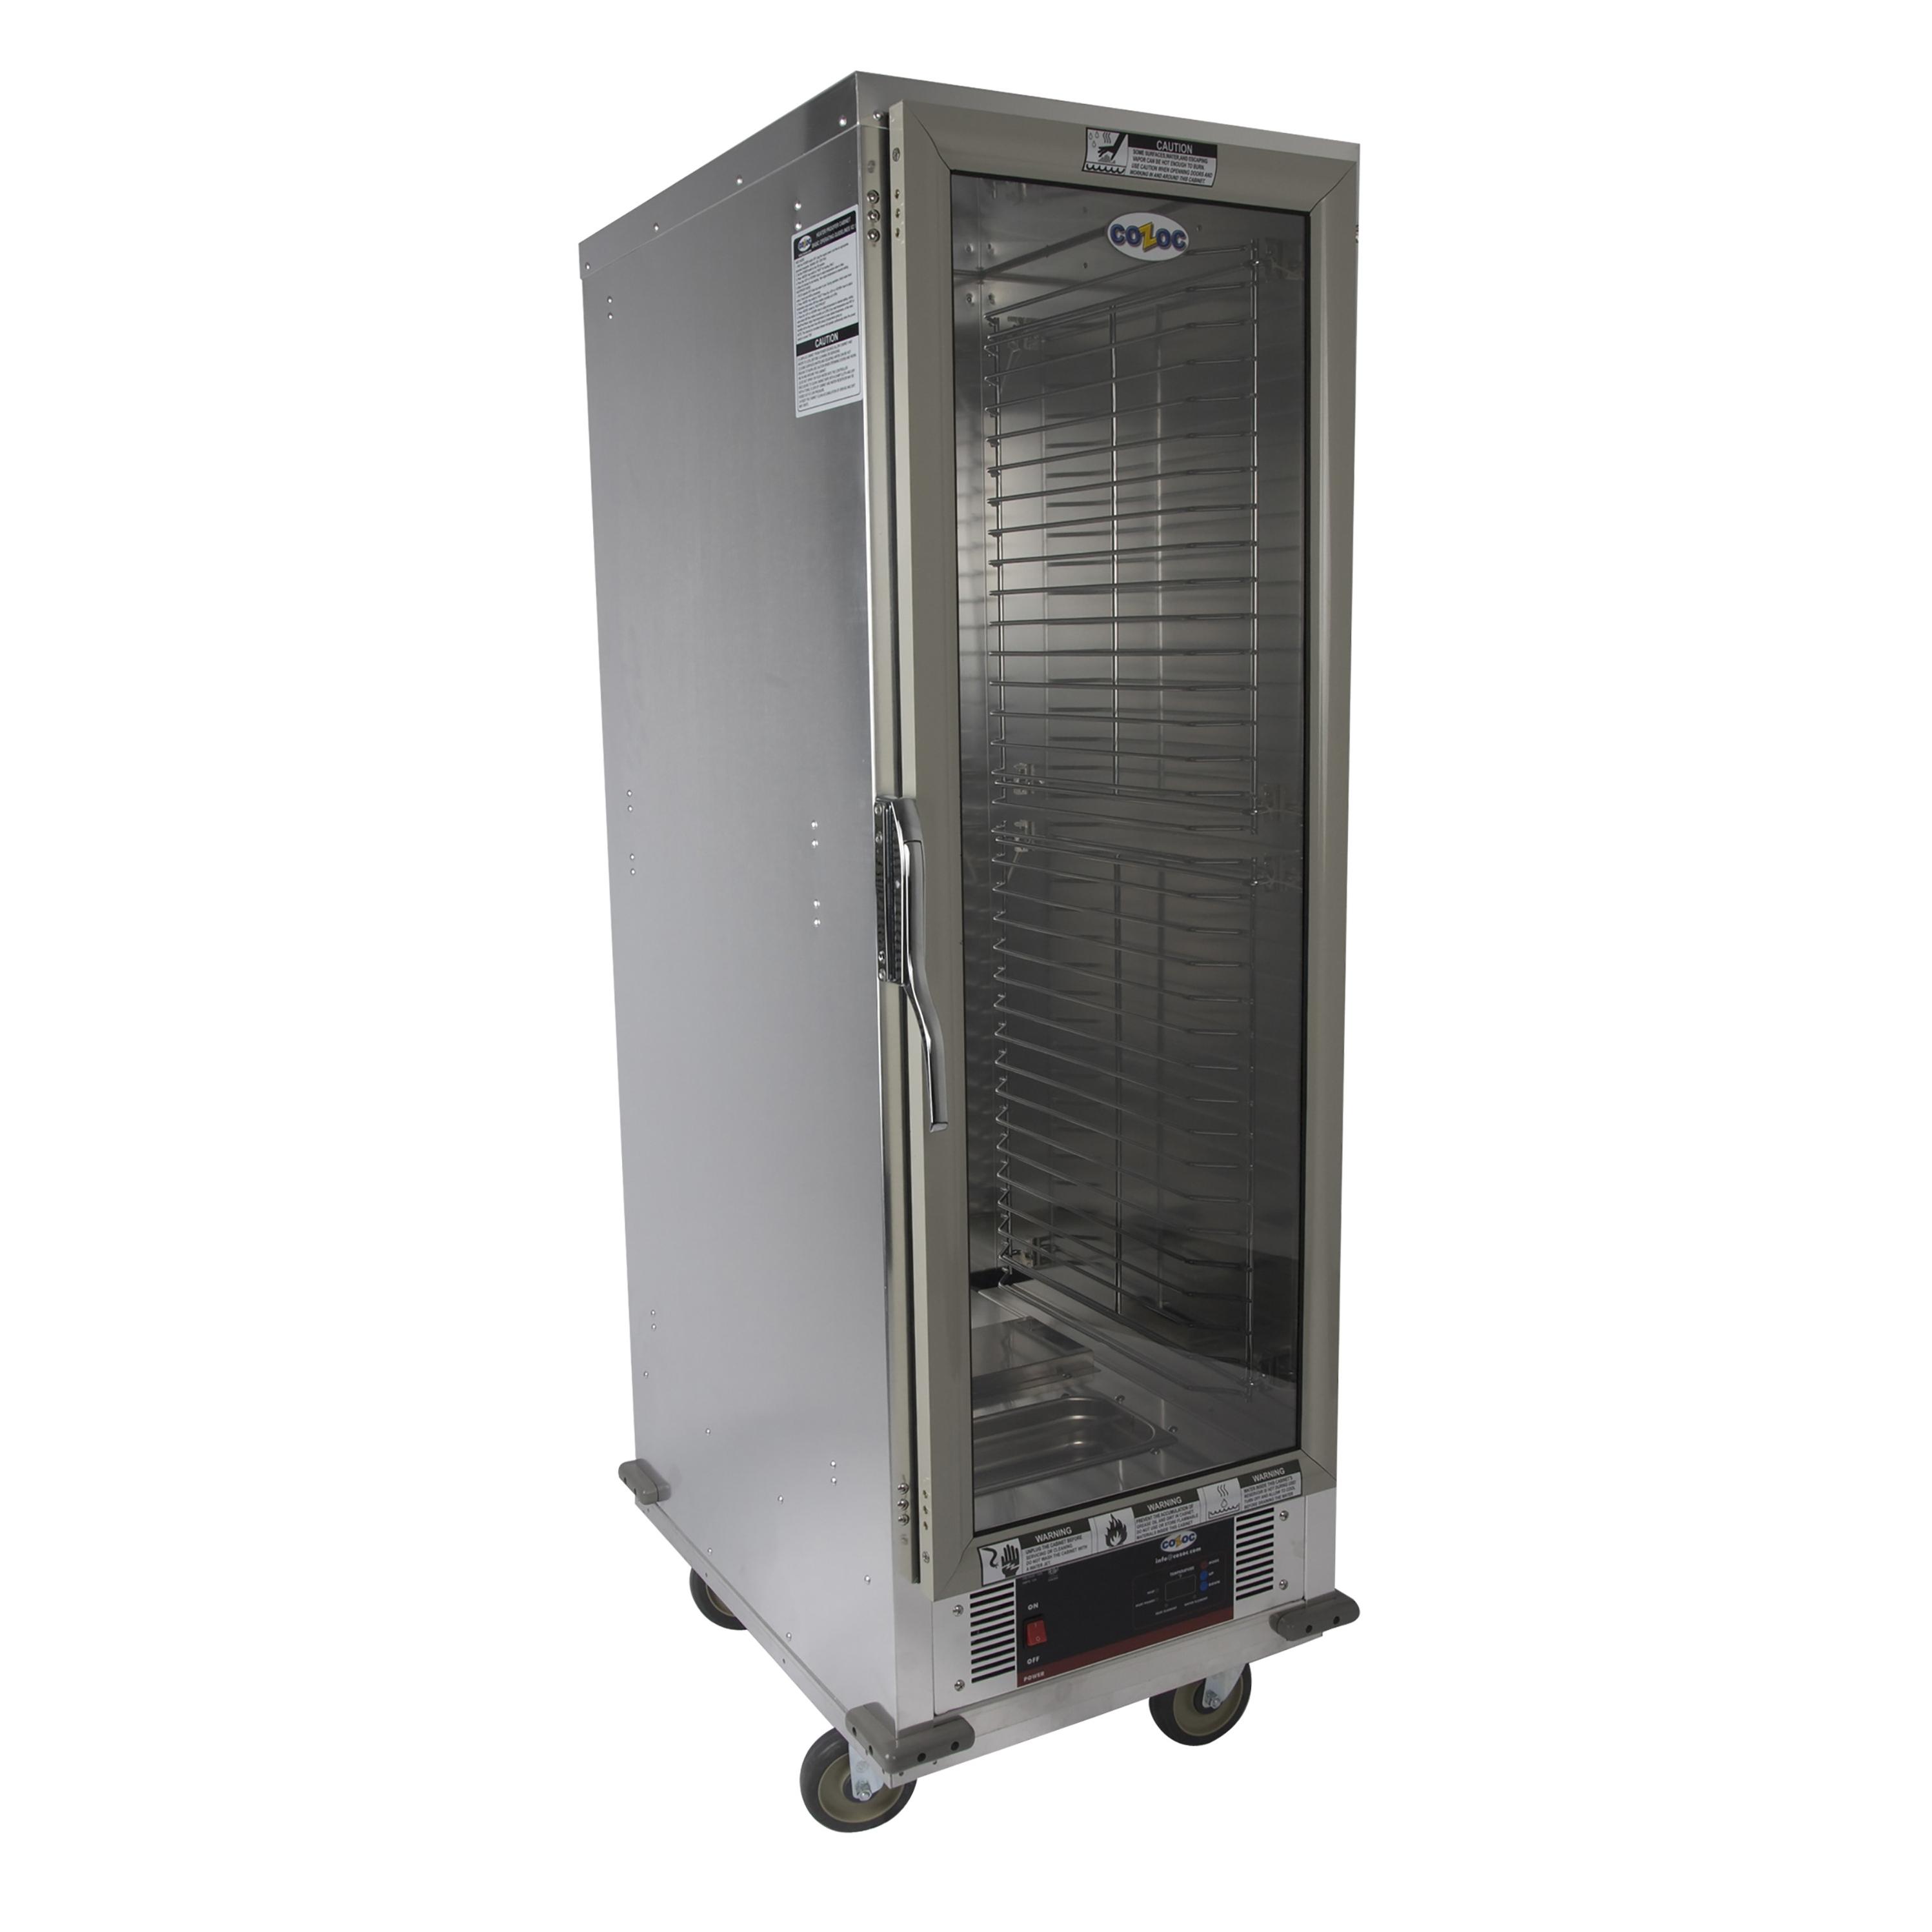 HPC7000-C9F8